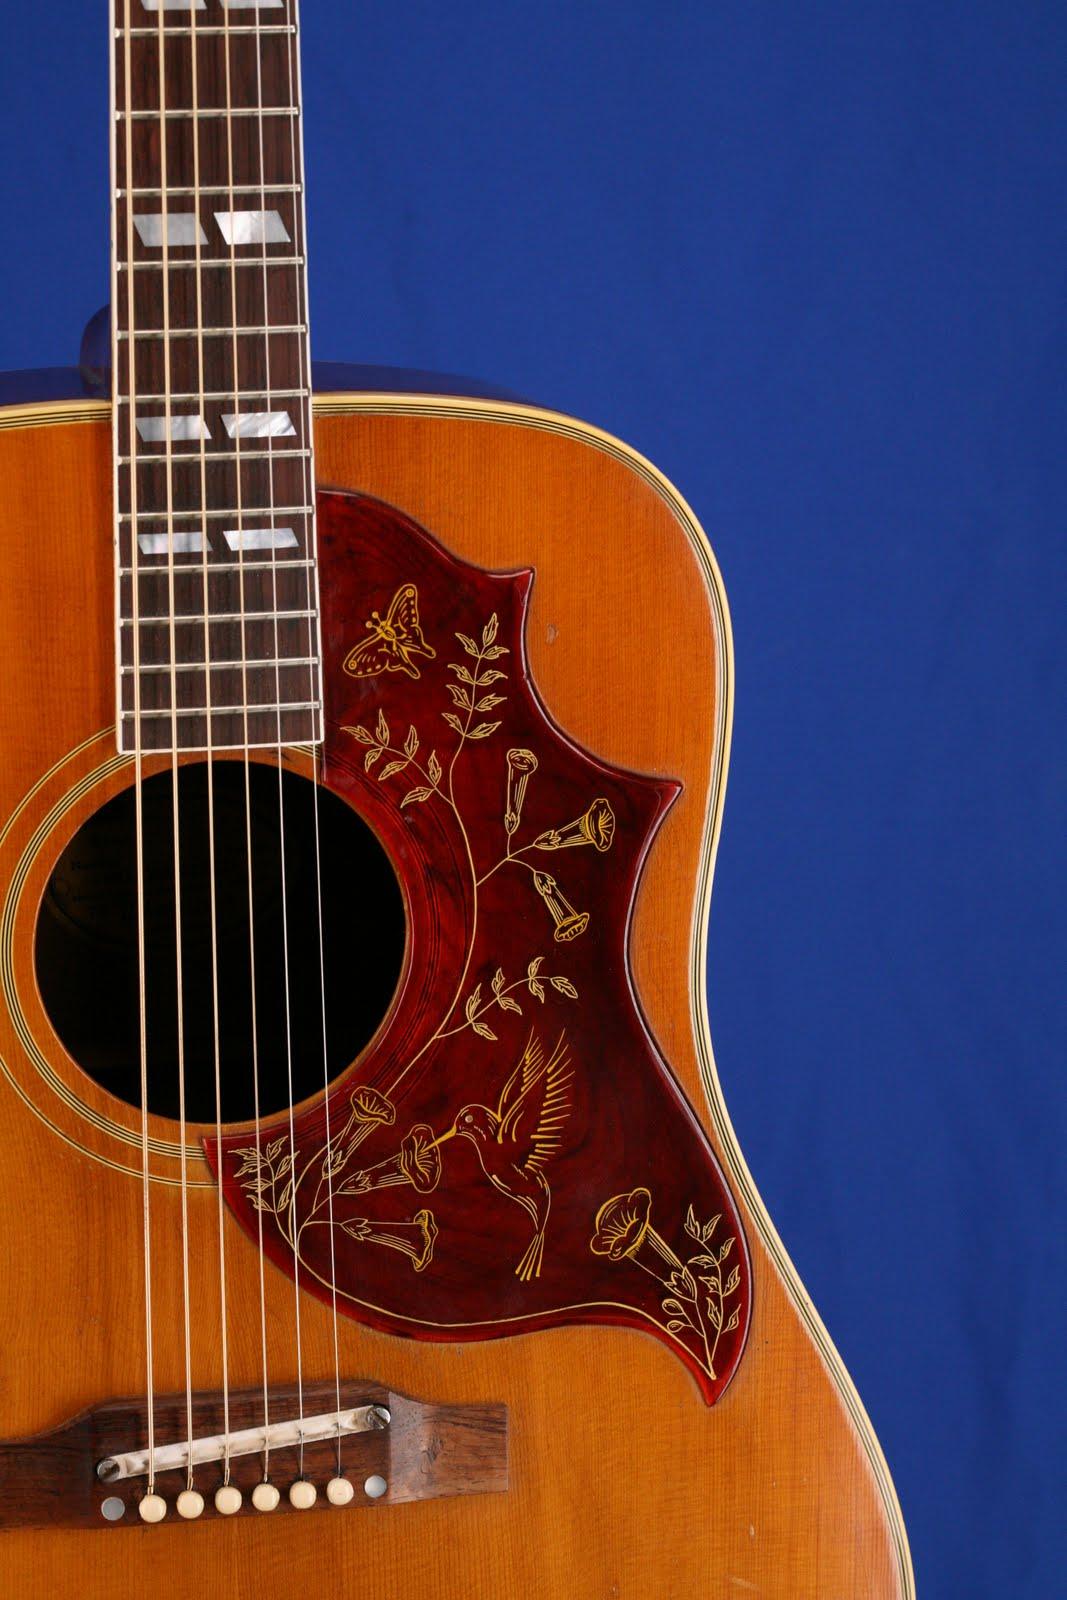 Guitars-A-Go-Go: 1965 Gibson Hummingbird